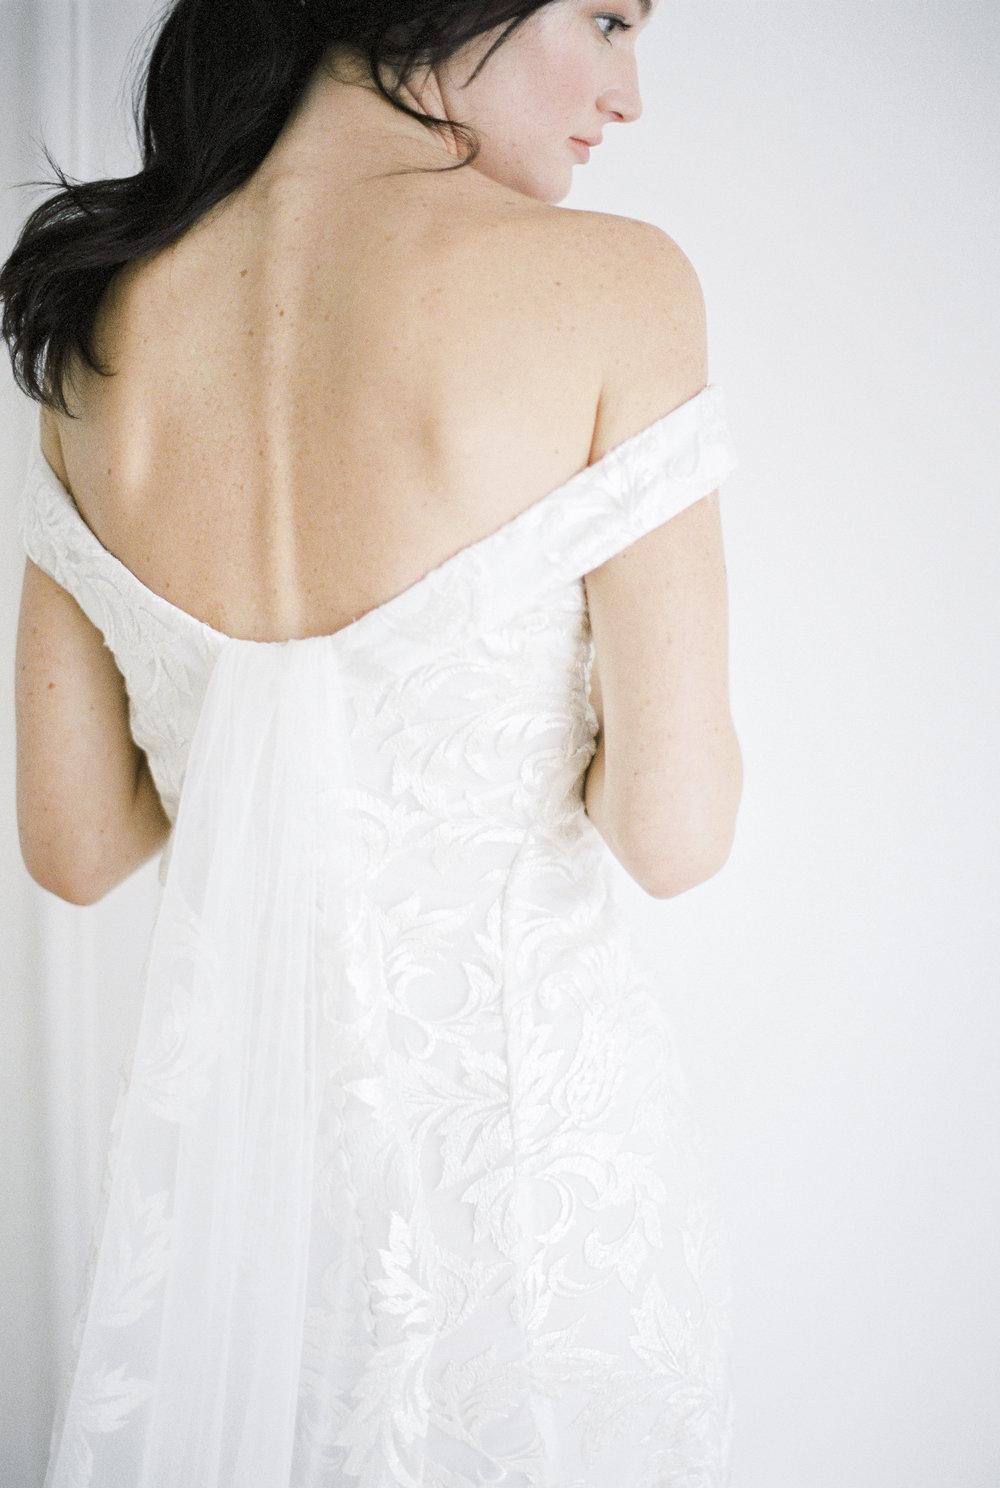 Ludovic Grau-Mingot - Film Photographer - Talitha - Wedding dresses - Collection 2019-76 (1).jpg